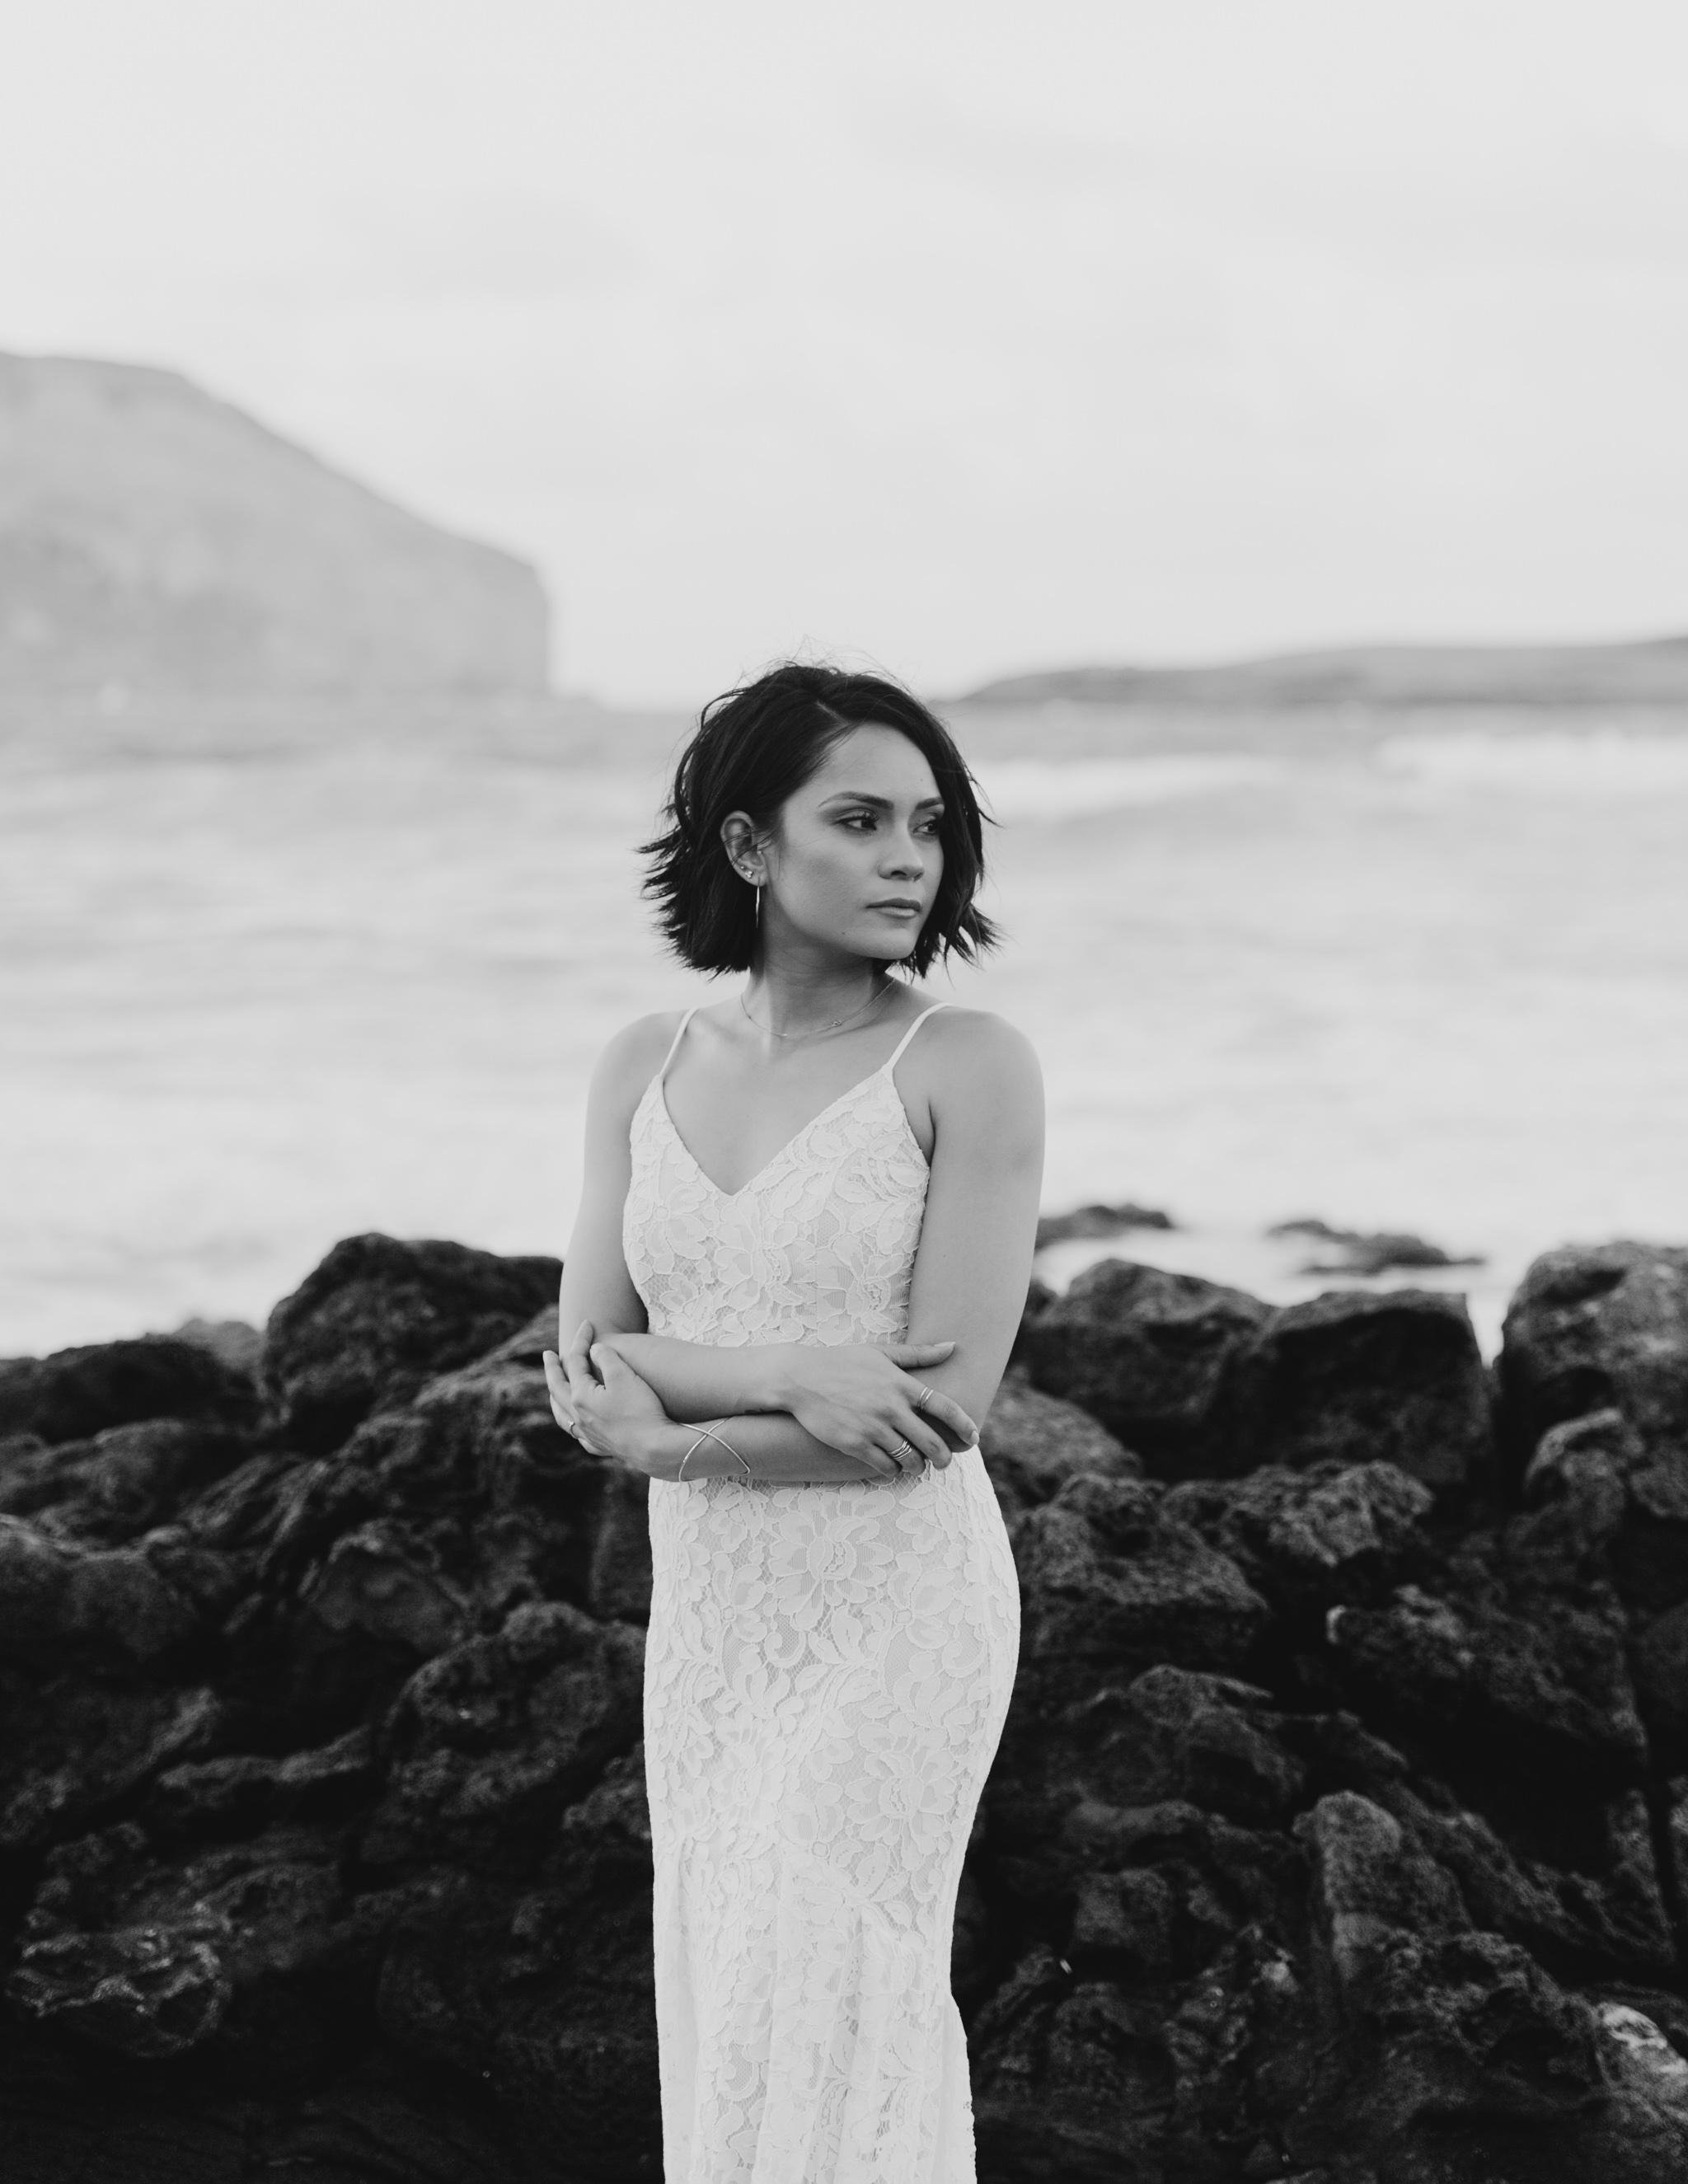 makapuu bridal portraits by hawaii wedding photographer Desiree Leilani